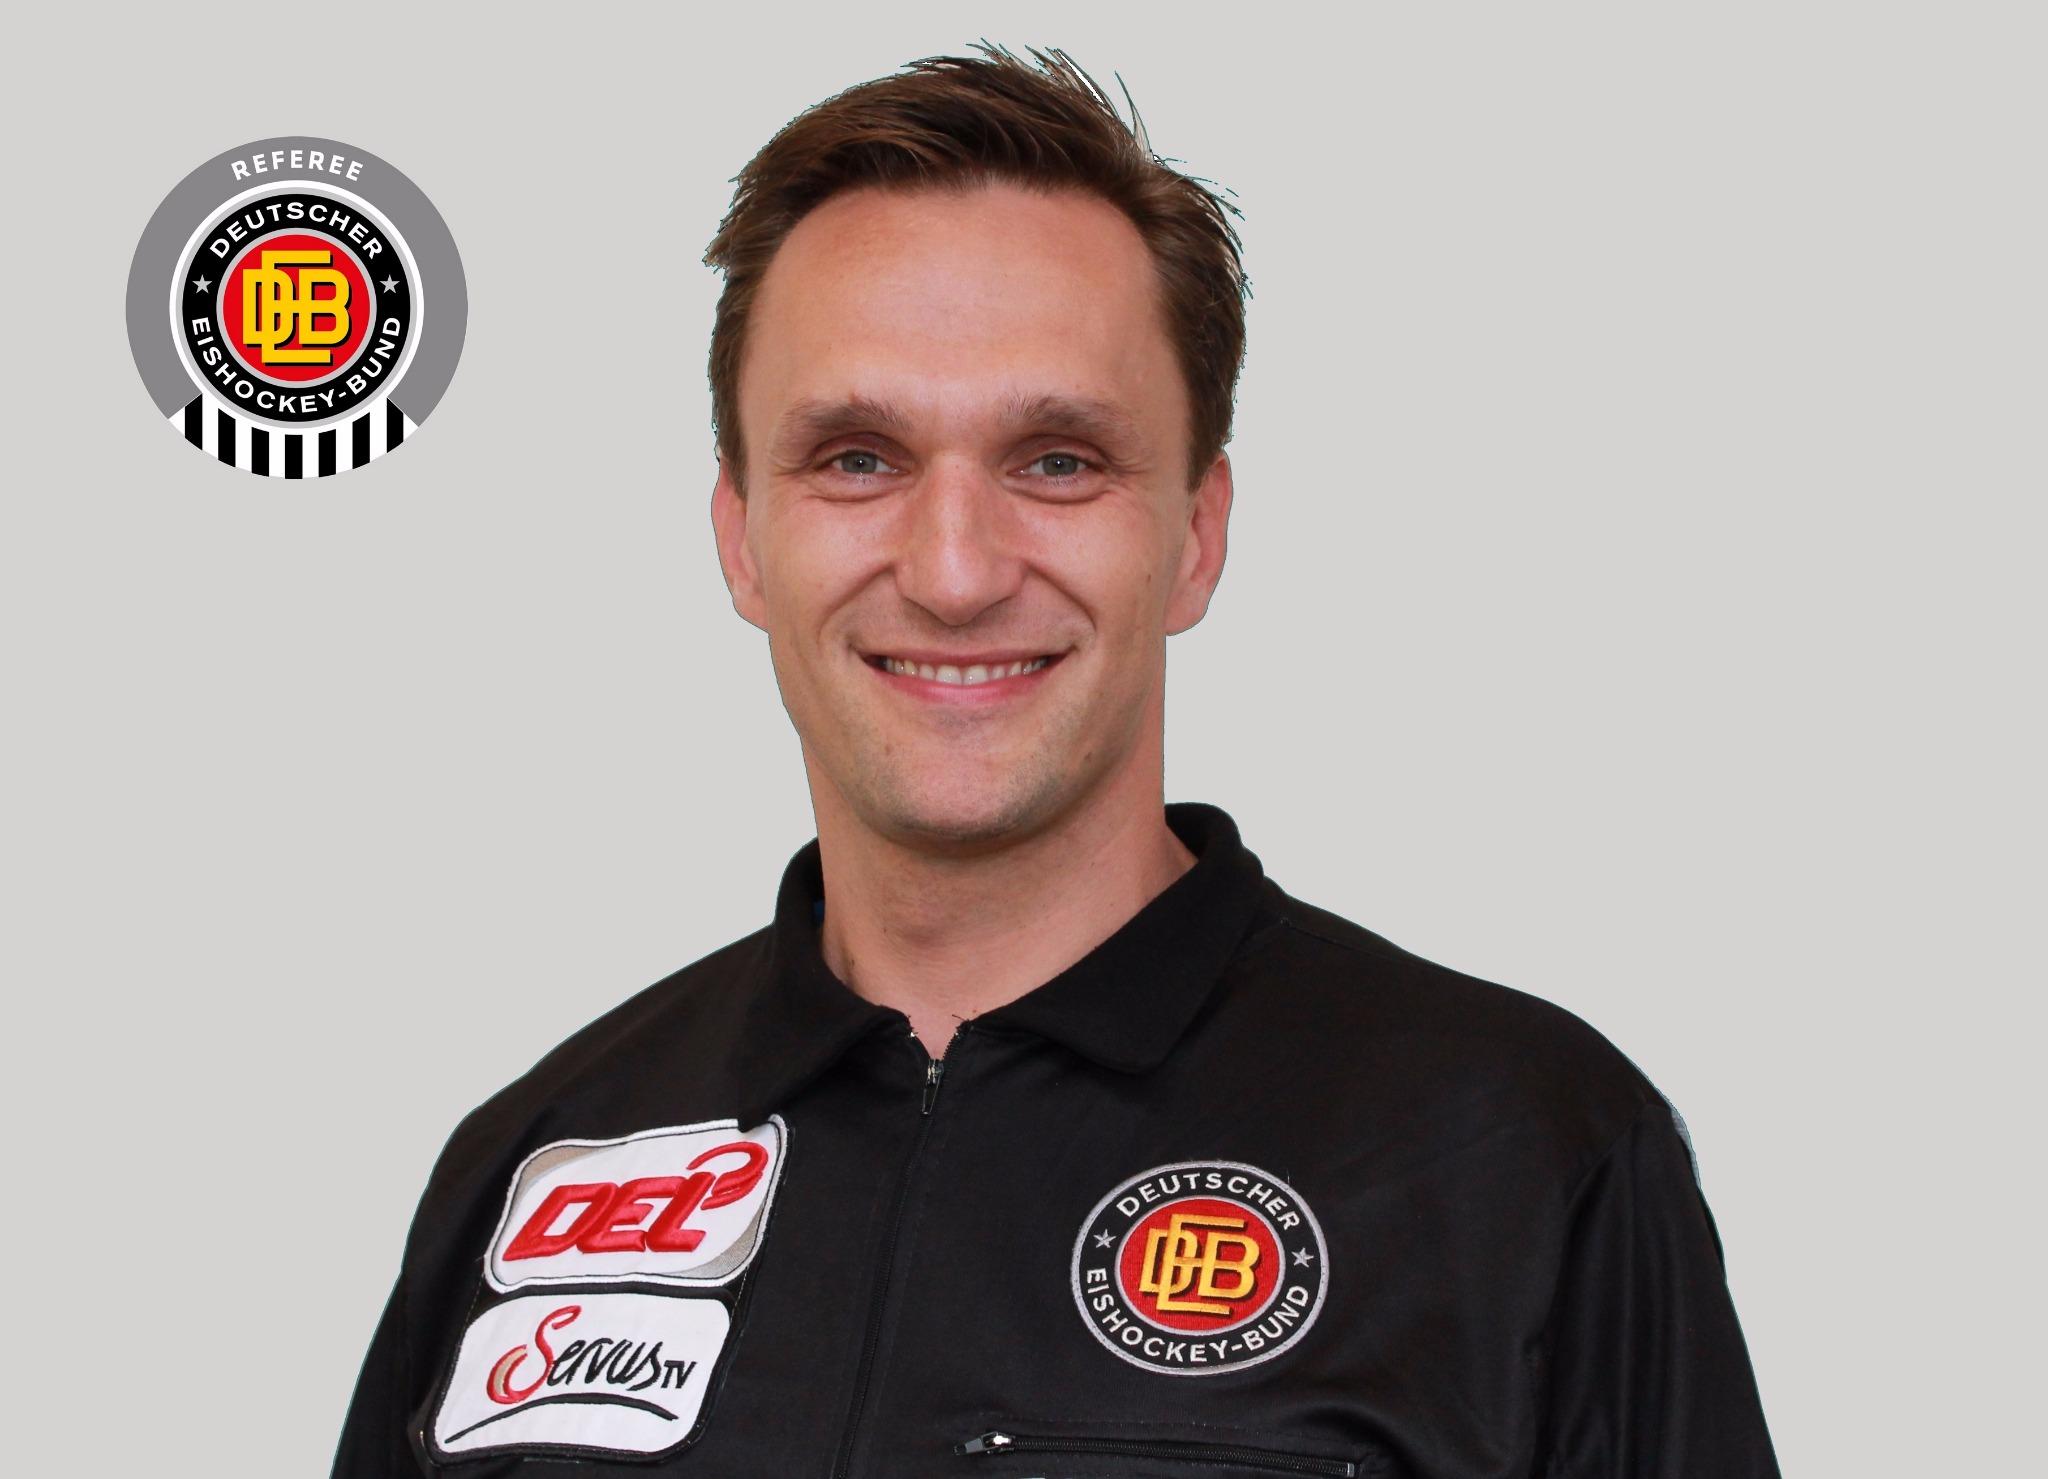 Daniel Piechaczek